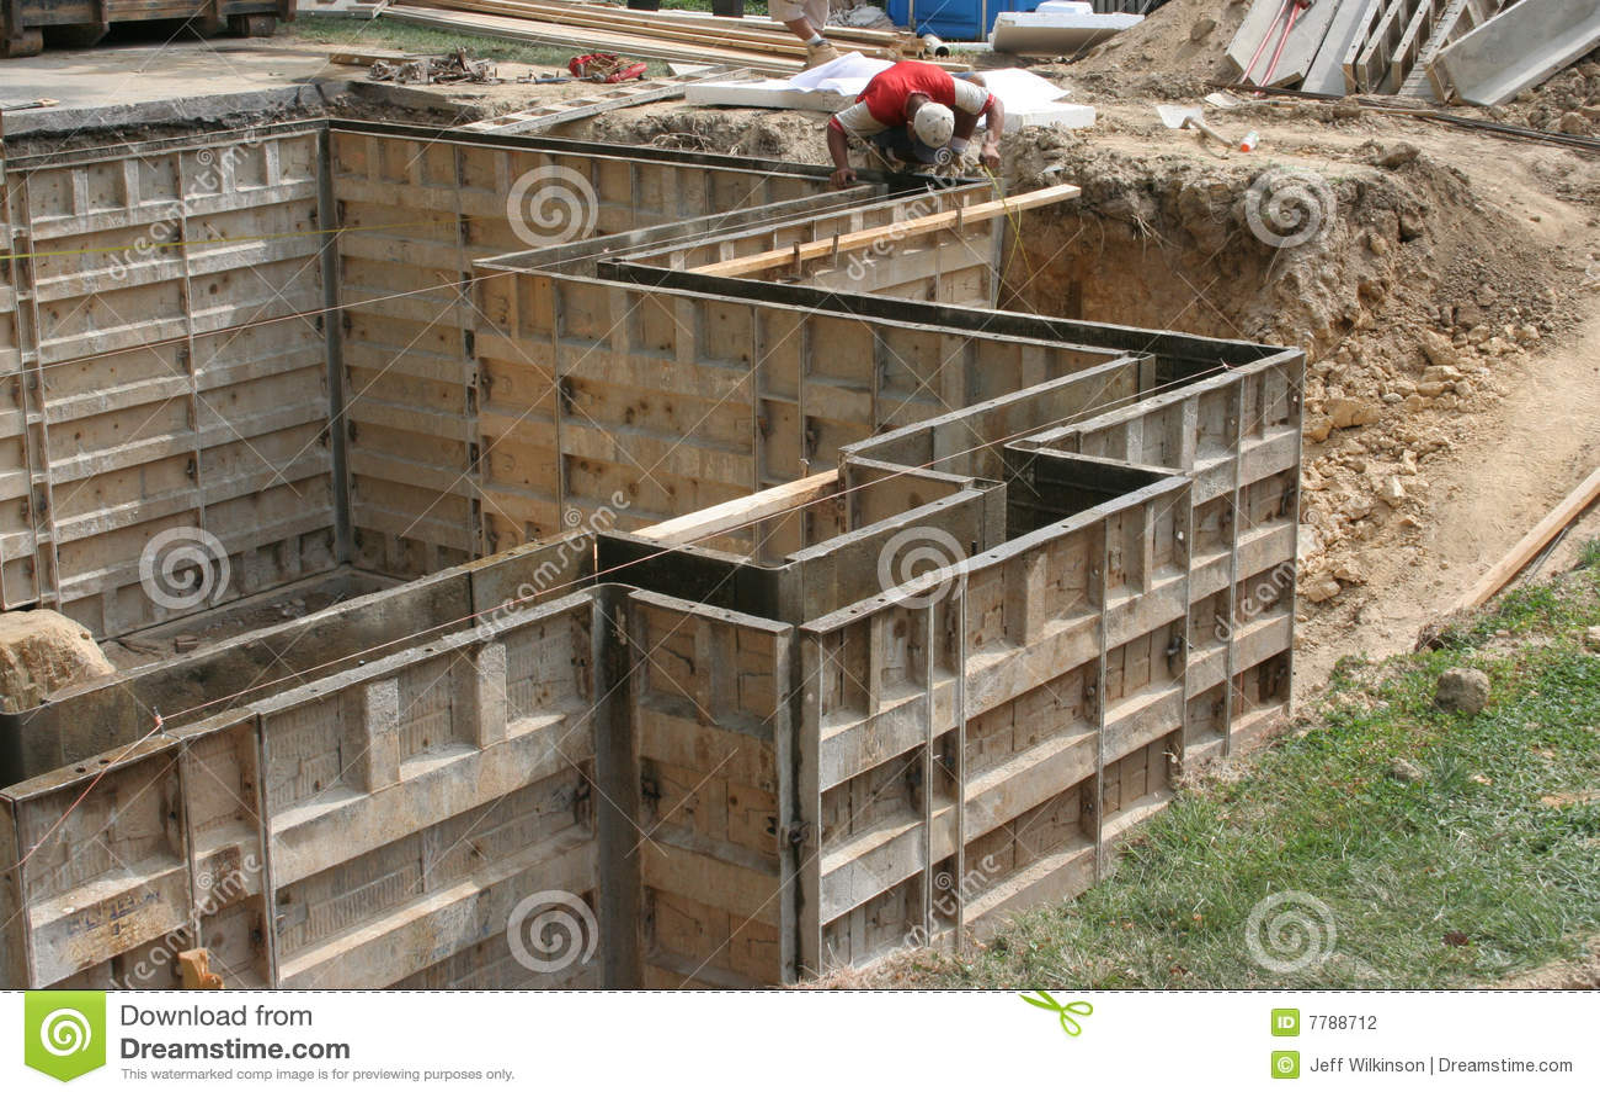 Formas De Pared Moldes Para El Concreto Fotograf 237 A De